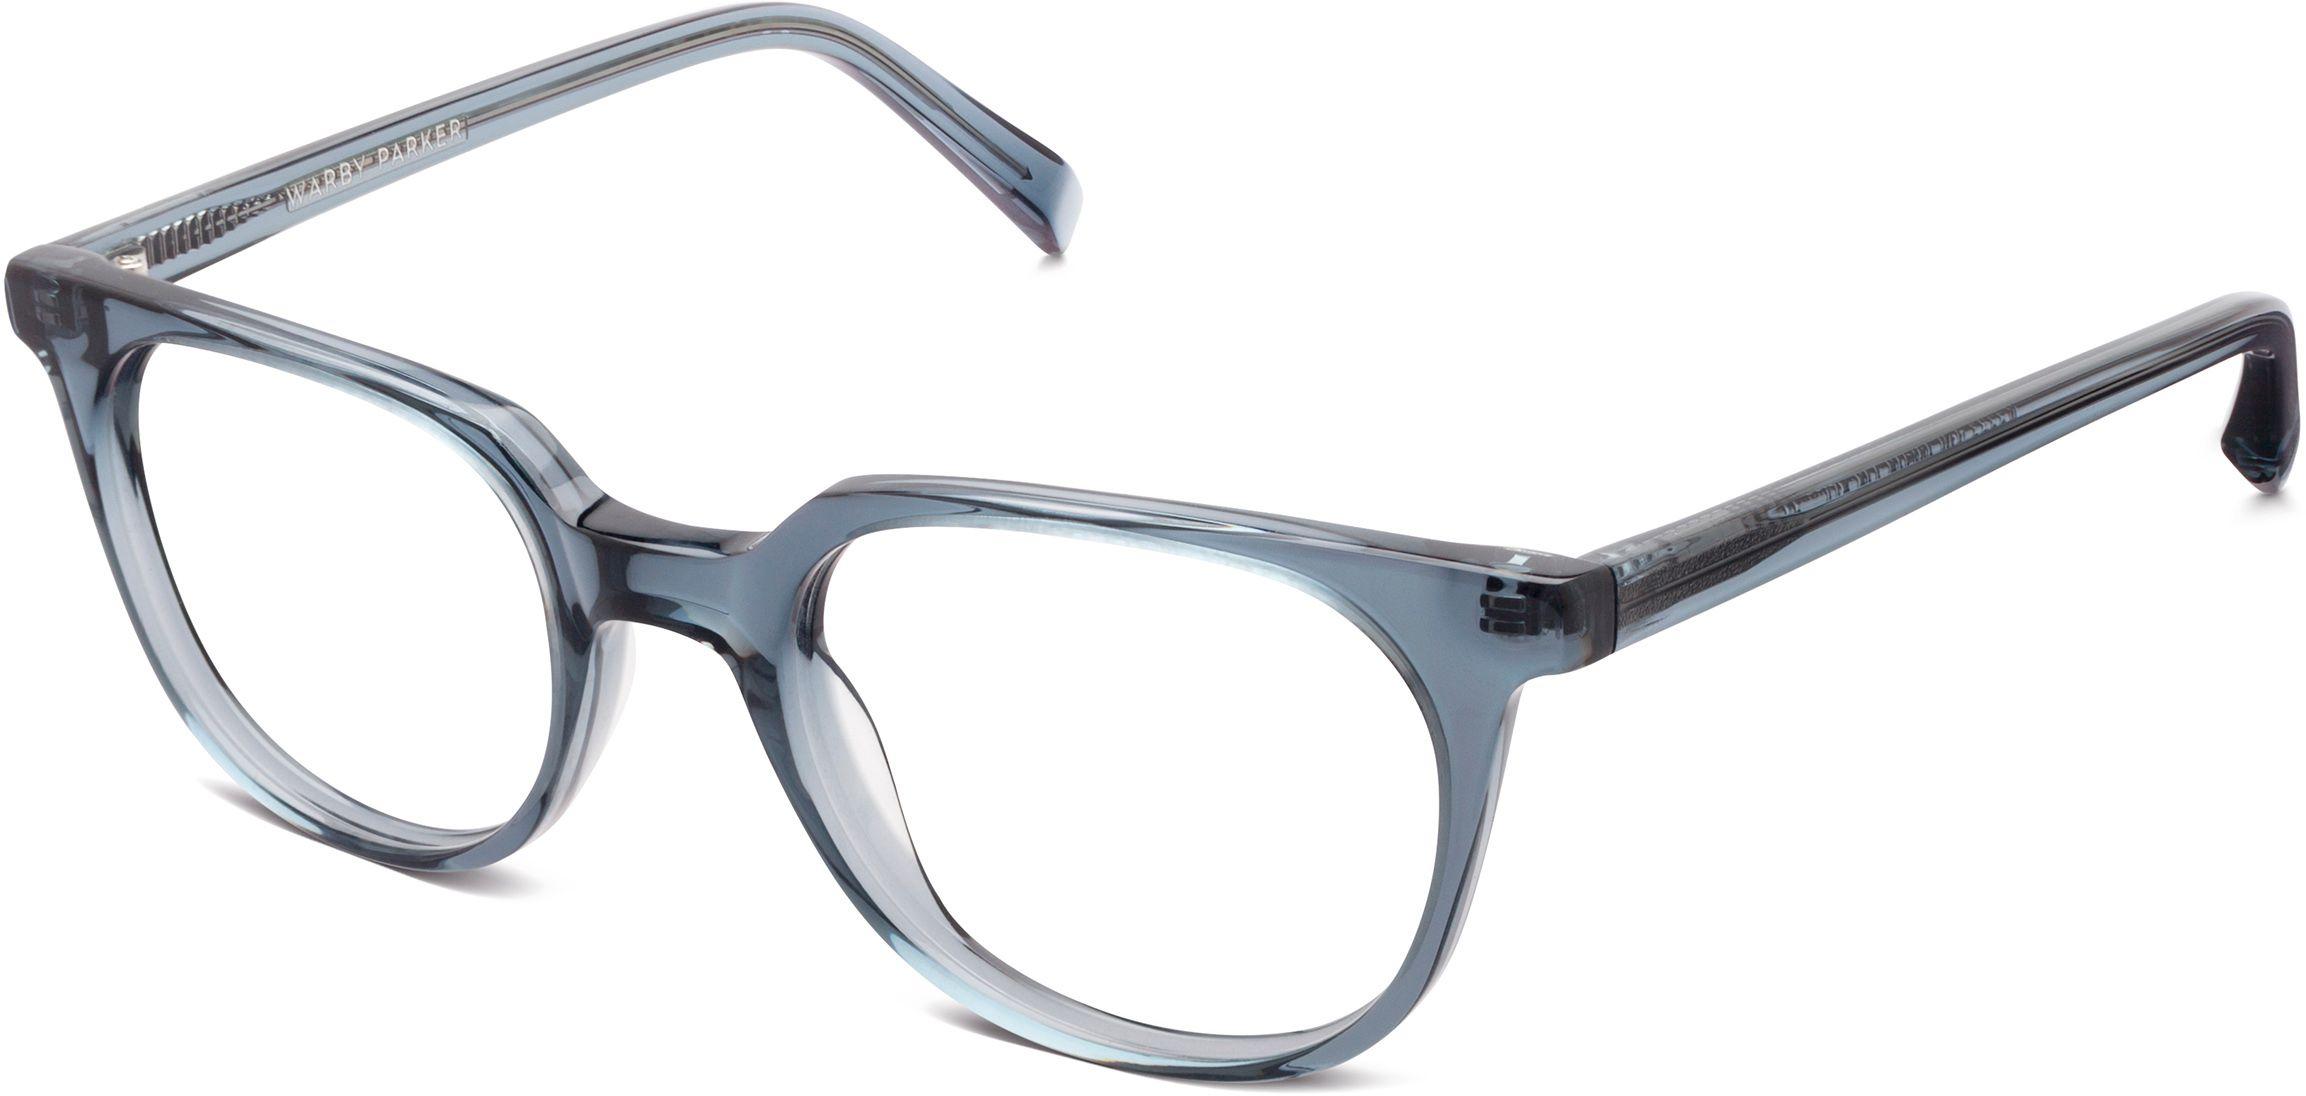 Keene Eyeglasses in Beach Glass for Men | Warby Parker